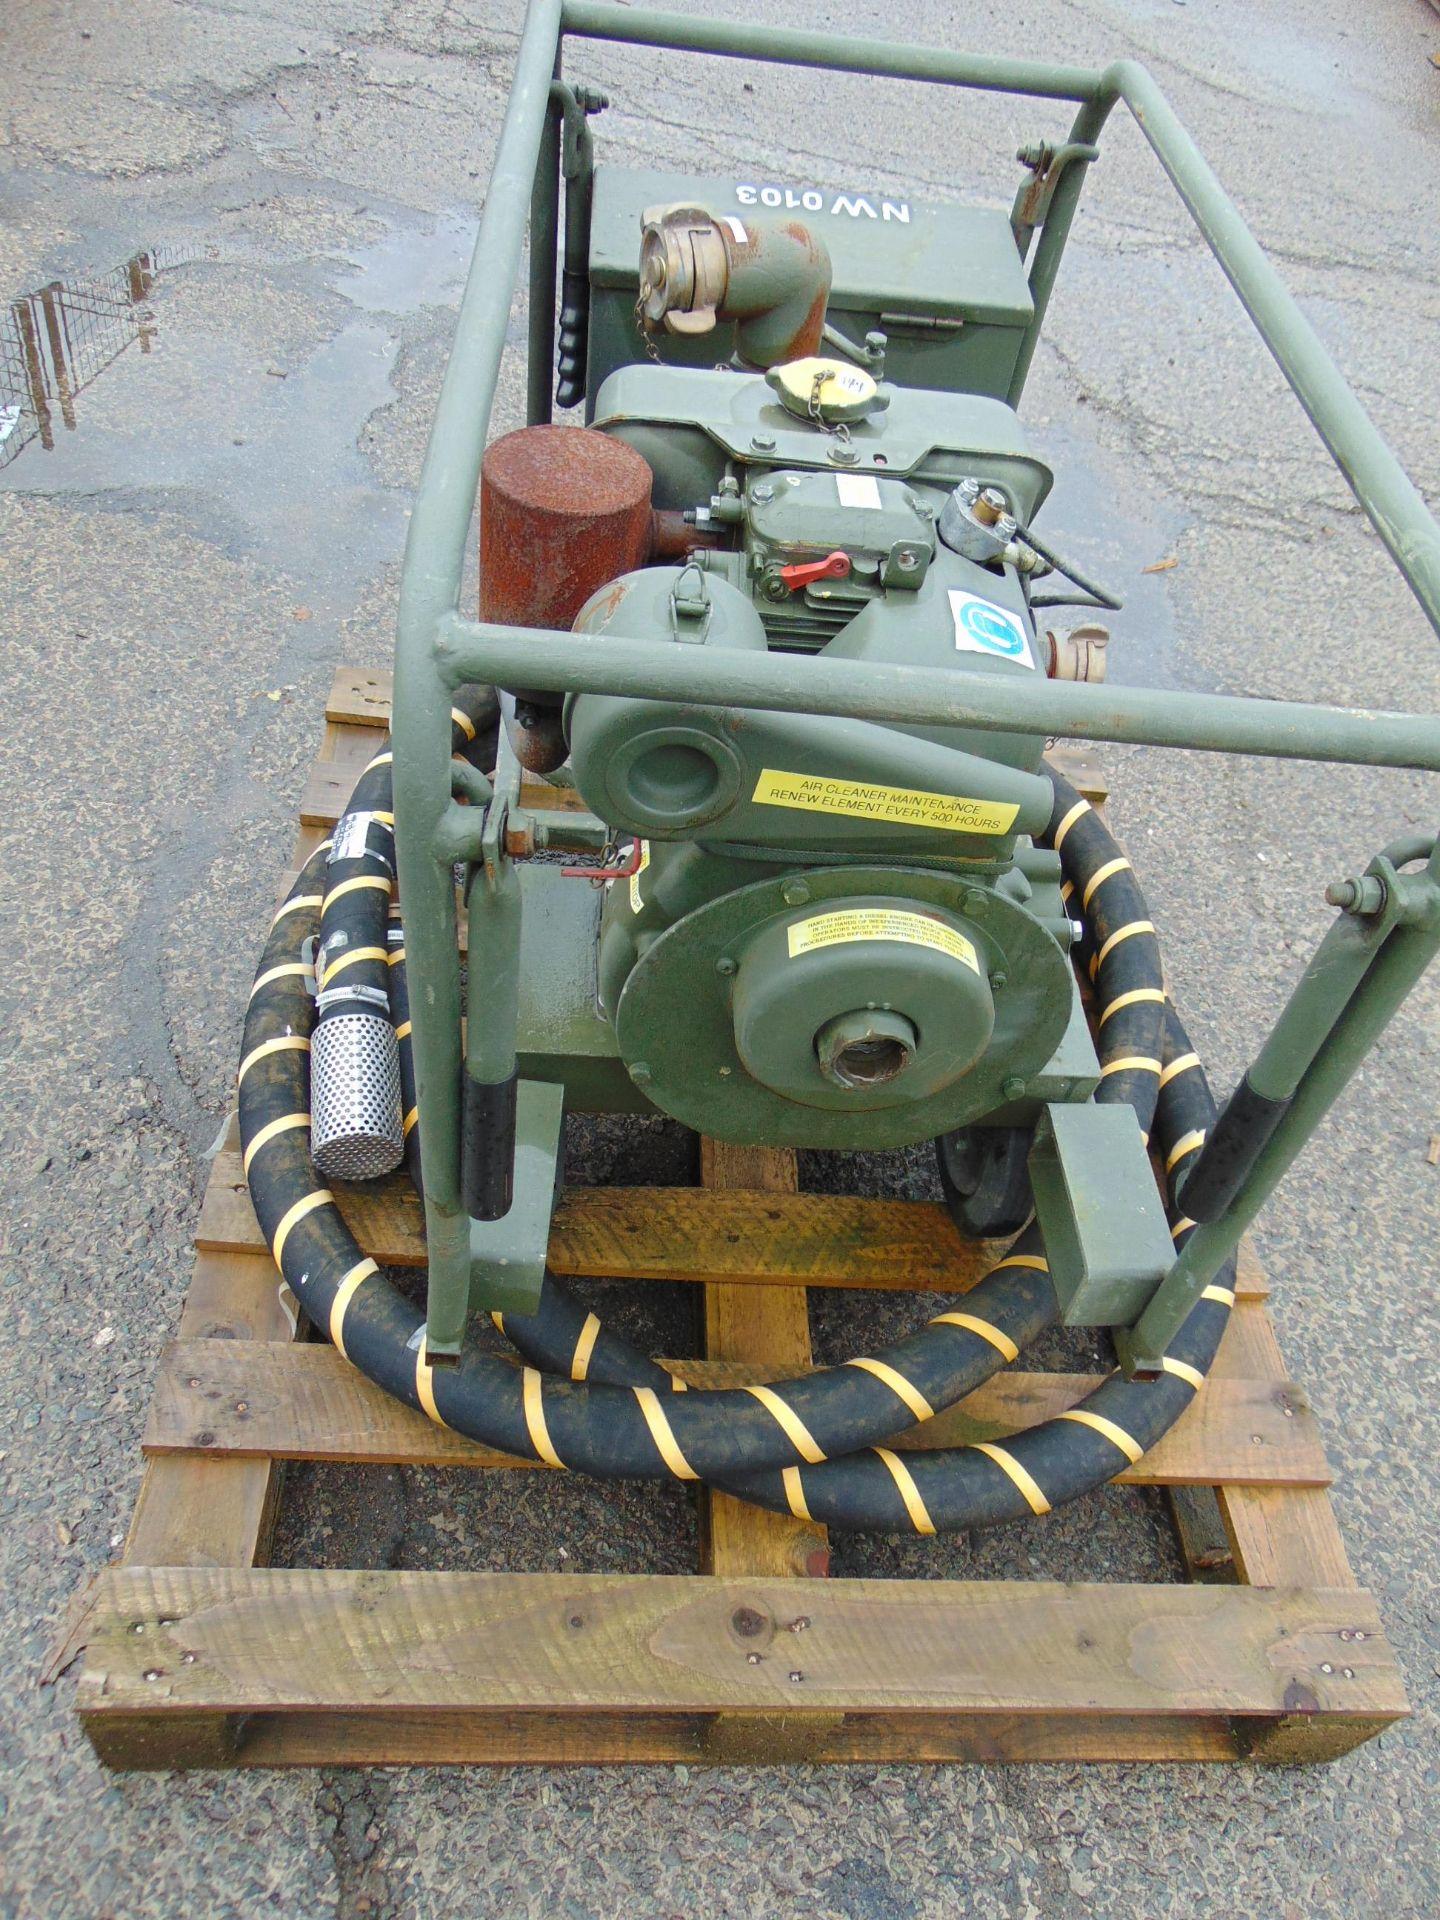 Lotto 26432 - Gilbert Gilkes Gordon General Purpose Diesel Water Pumpset